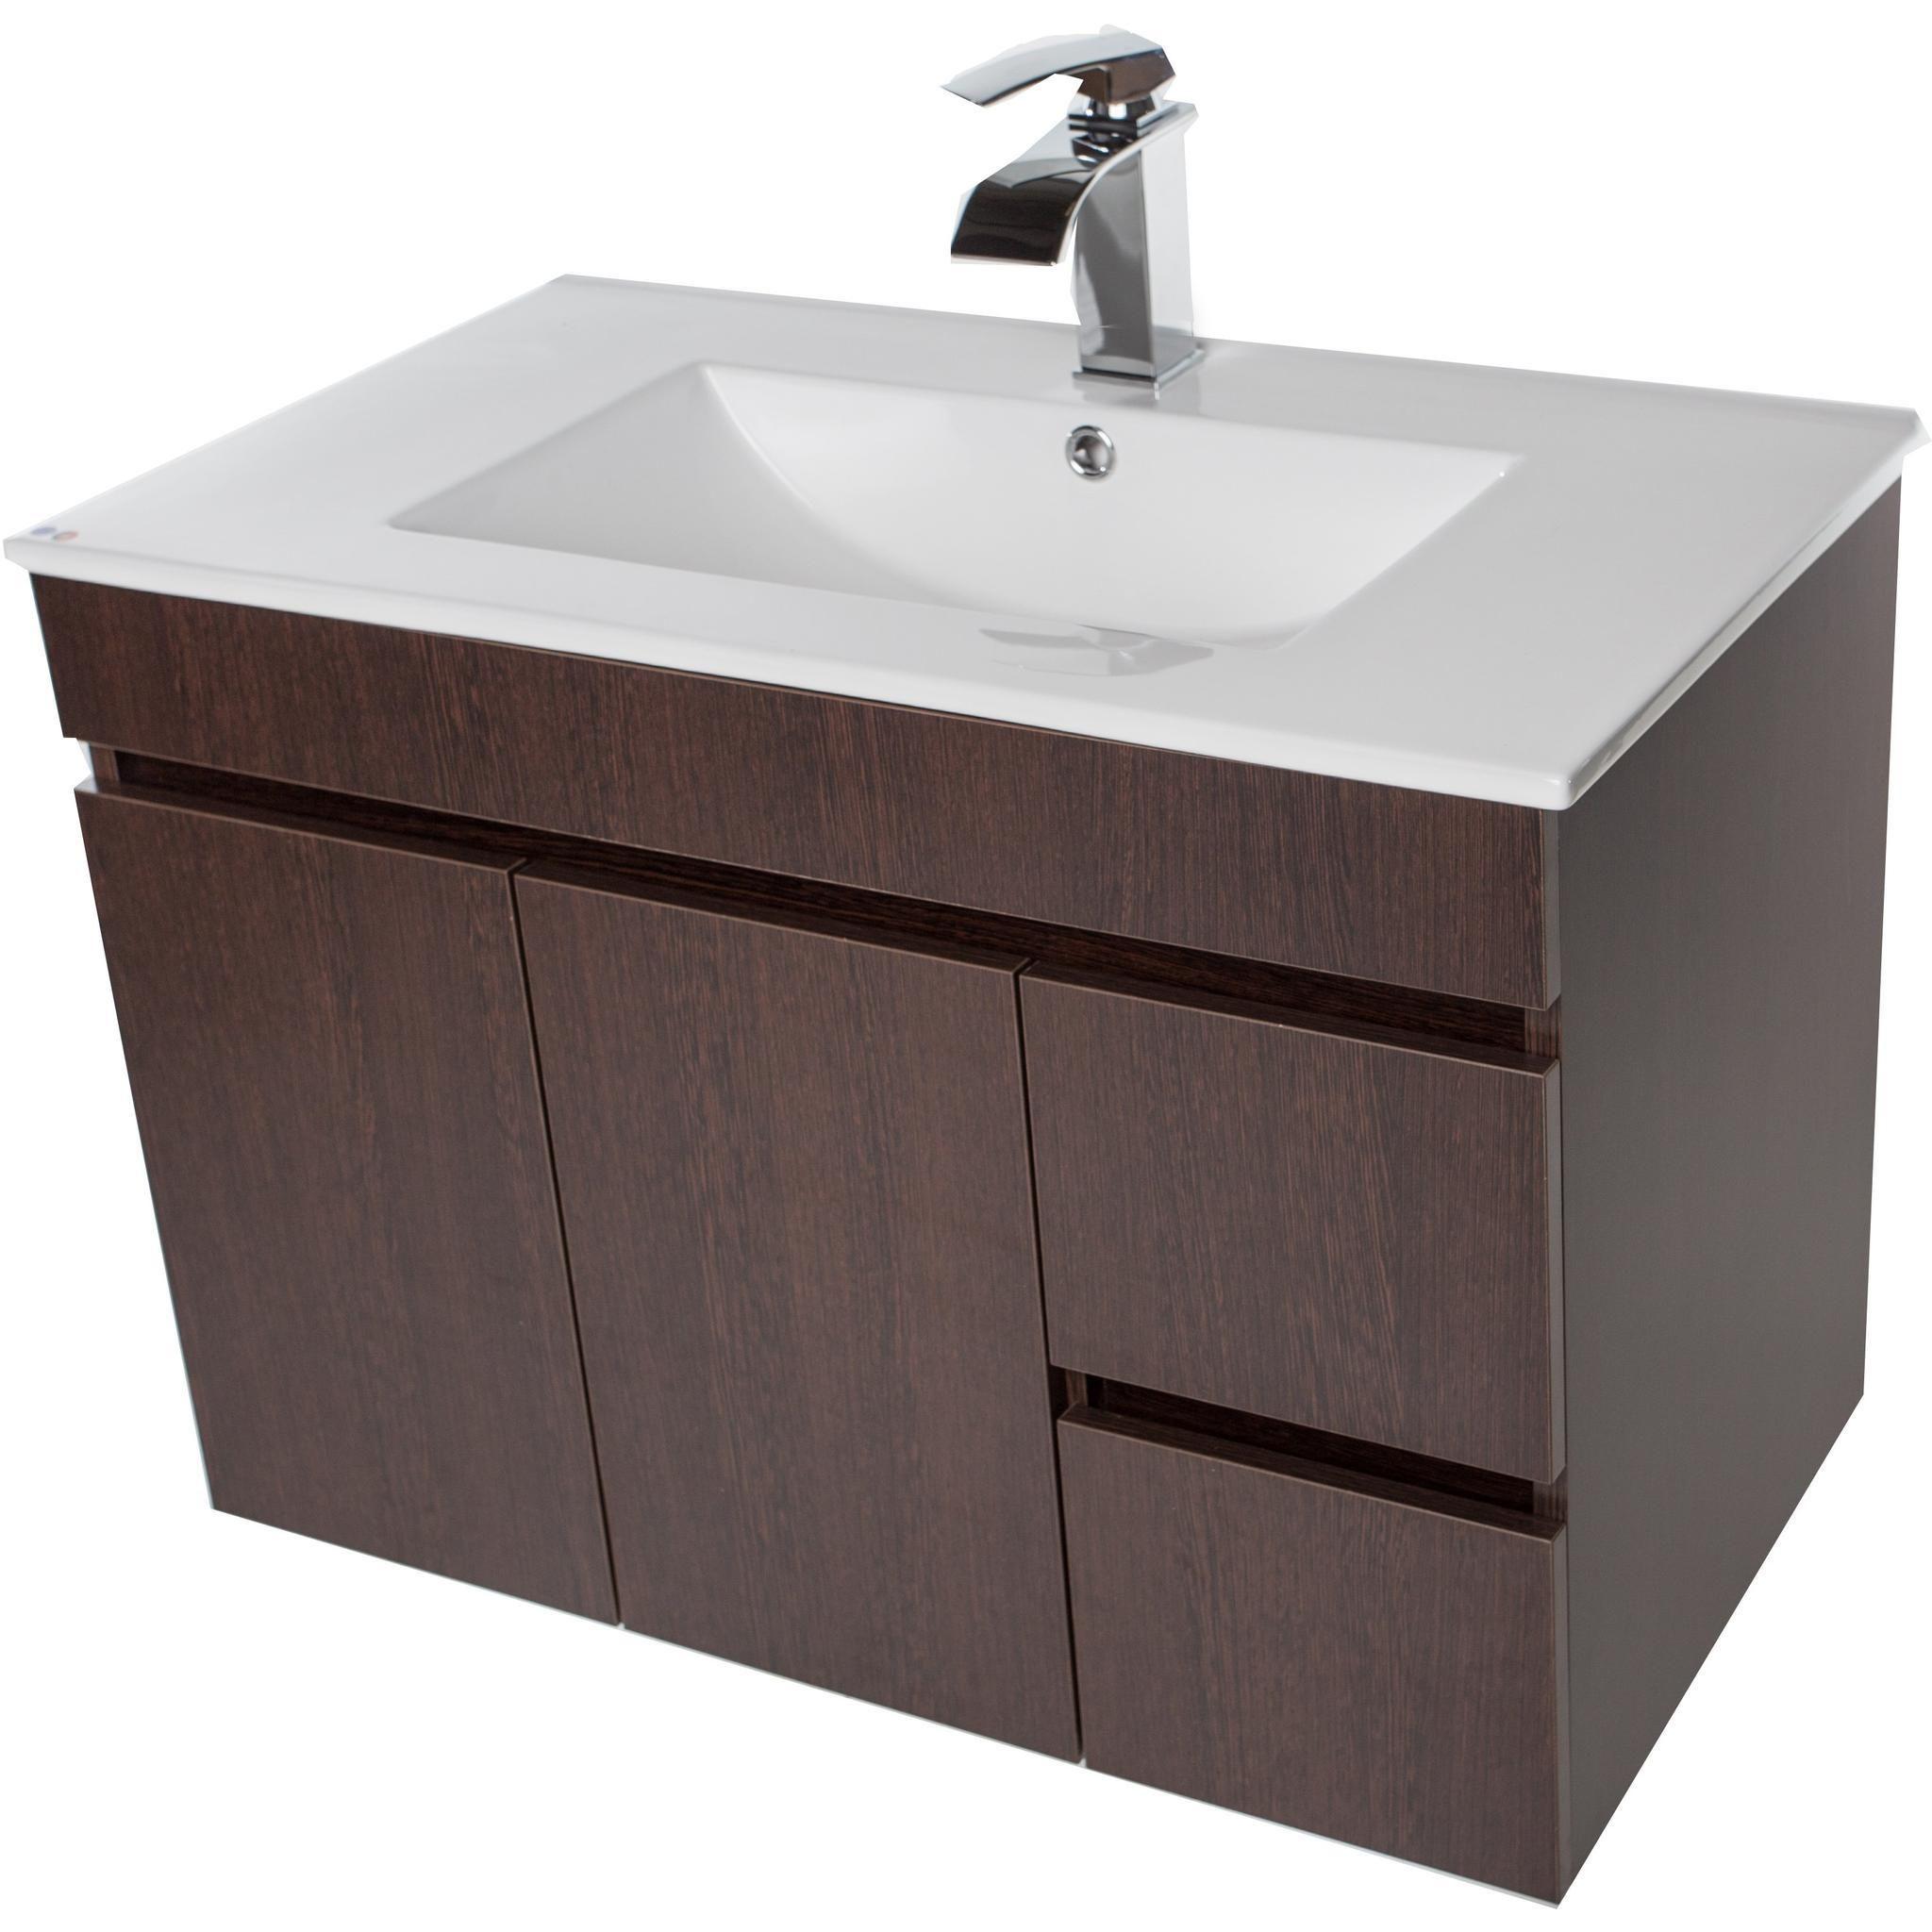 Strato 32 Wall Mounted Bathroom Sinks Bathroom Vanity Makeover Beautiful Bathroom Vanity